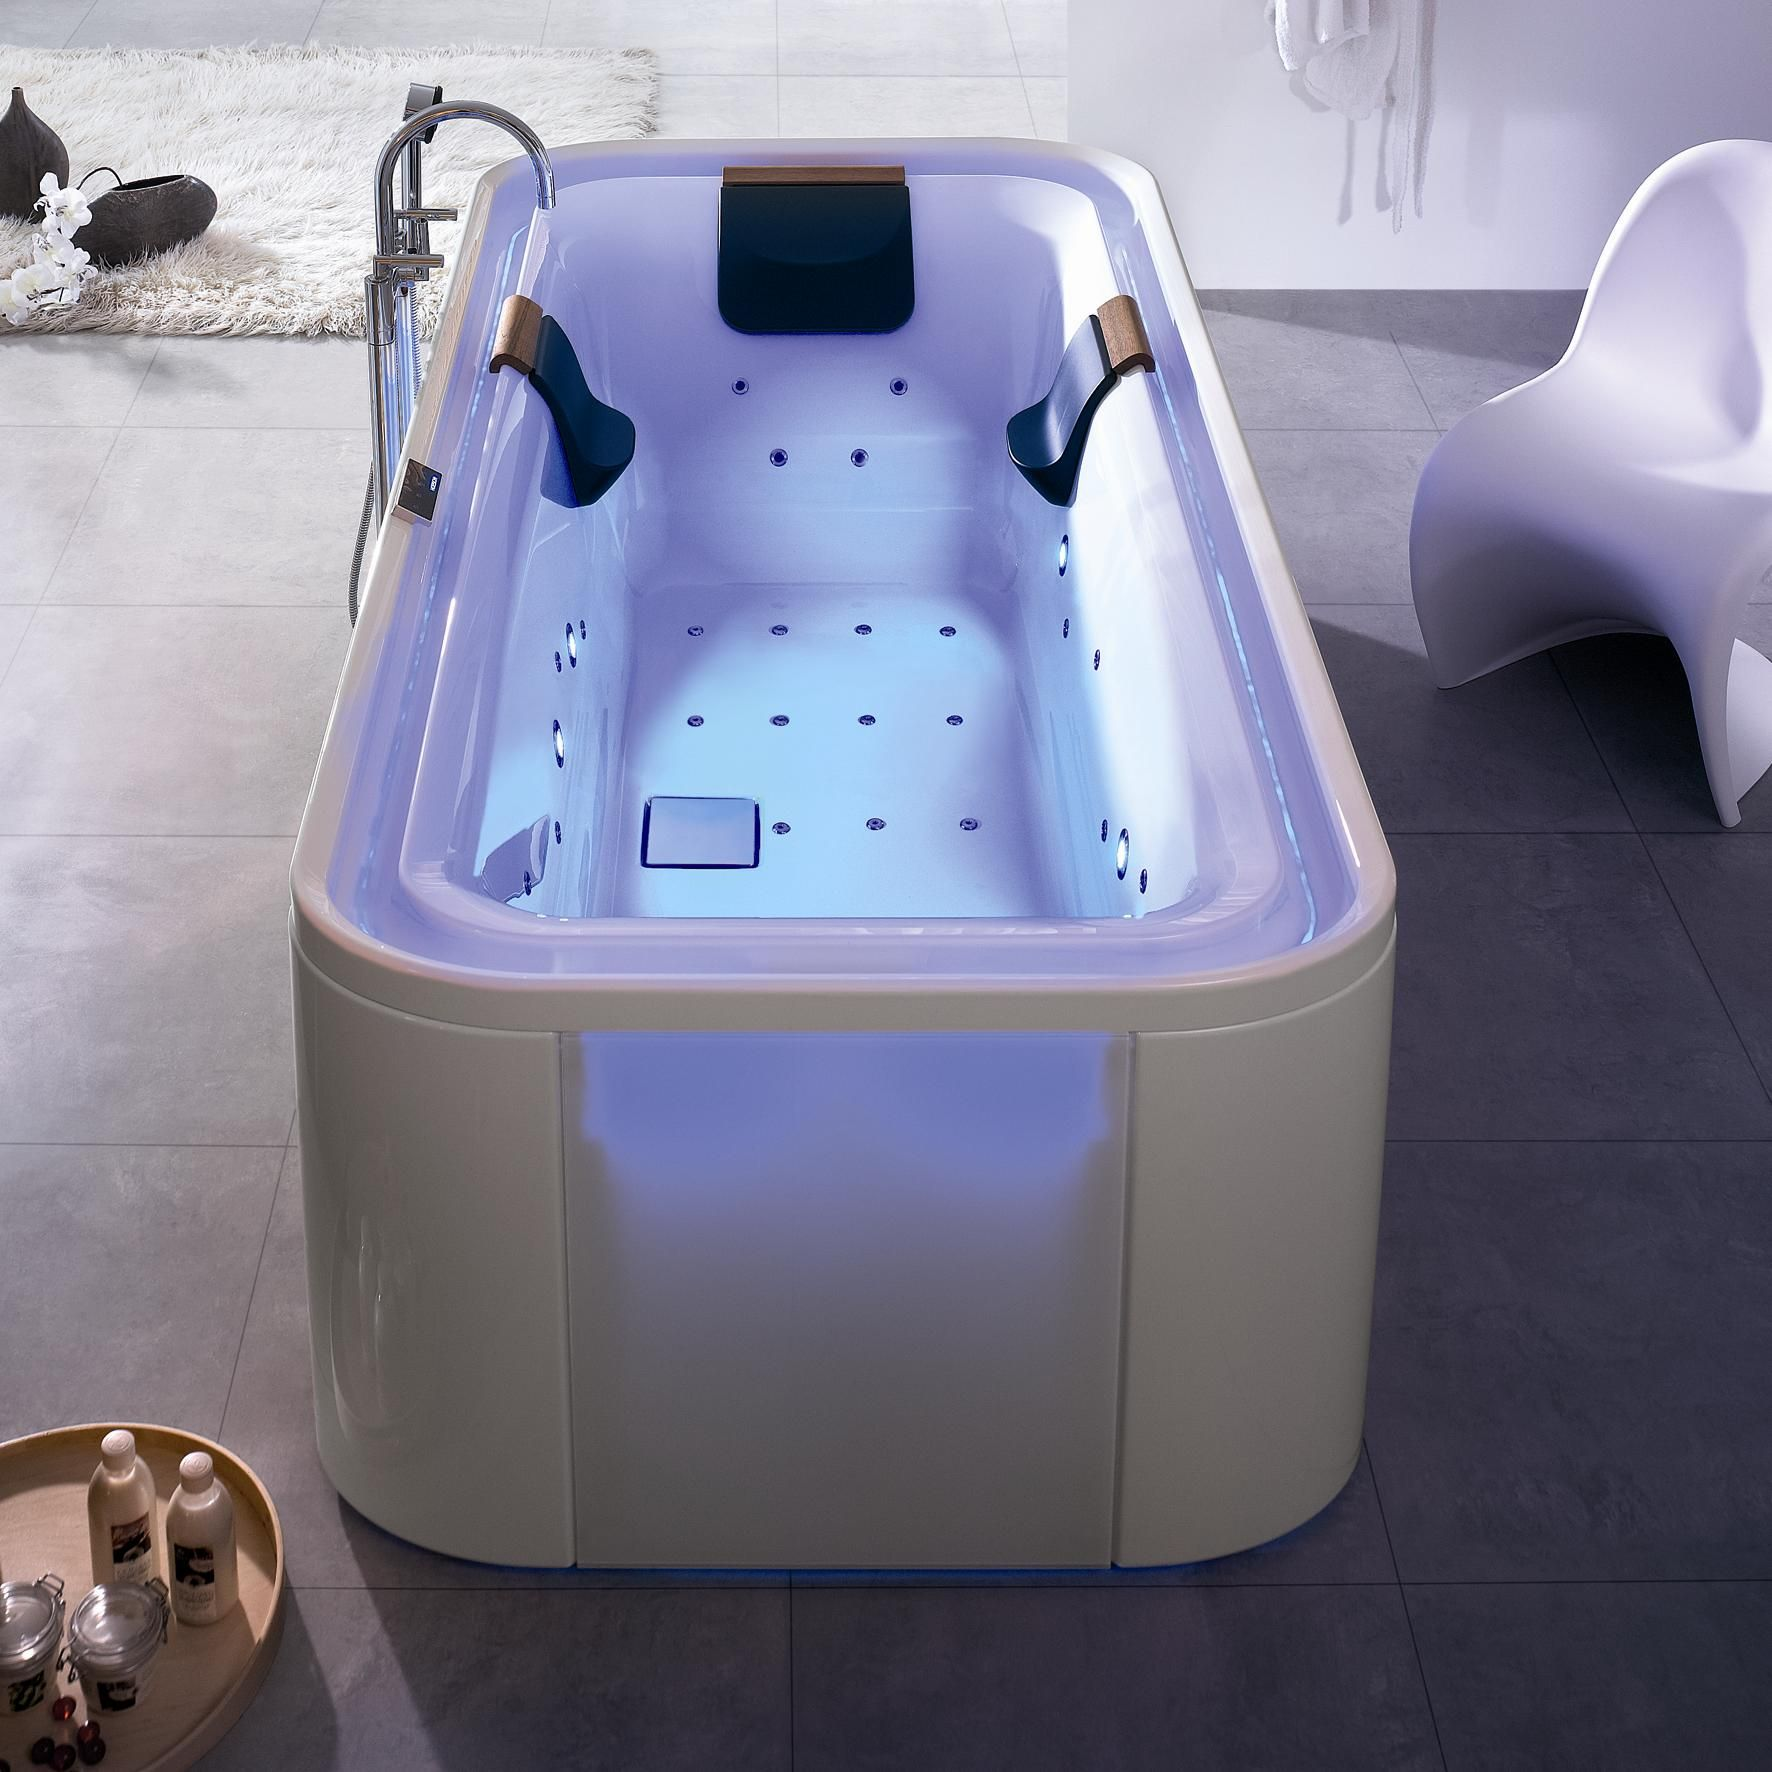 Vanny I Poddony Hoesch Vanny Bolshih Razmerov Hogart Art Interiordesign Design Apartment House Bathroom Bathtub Hoesch Badewanne Whirlpool Badezimmer